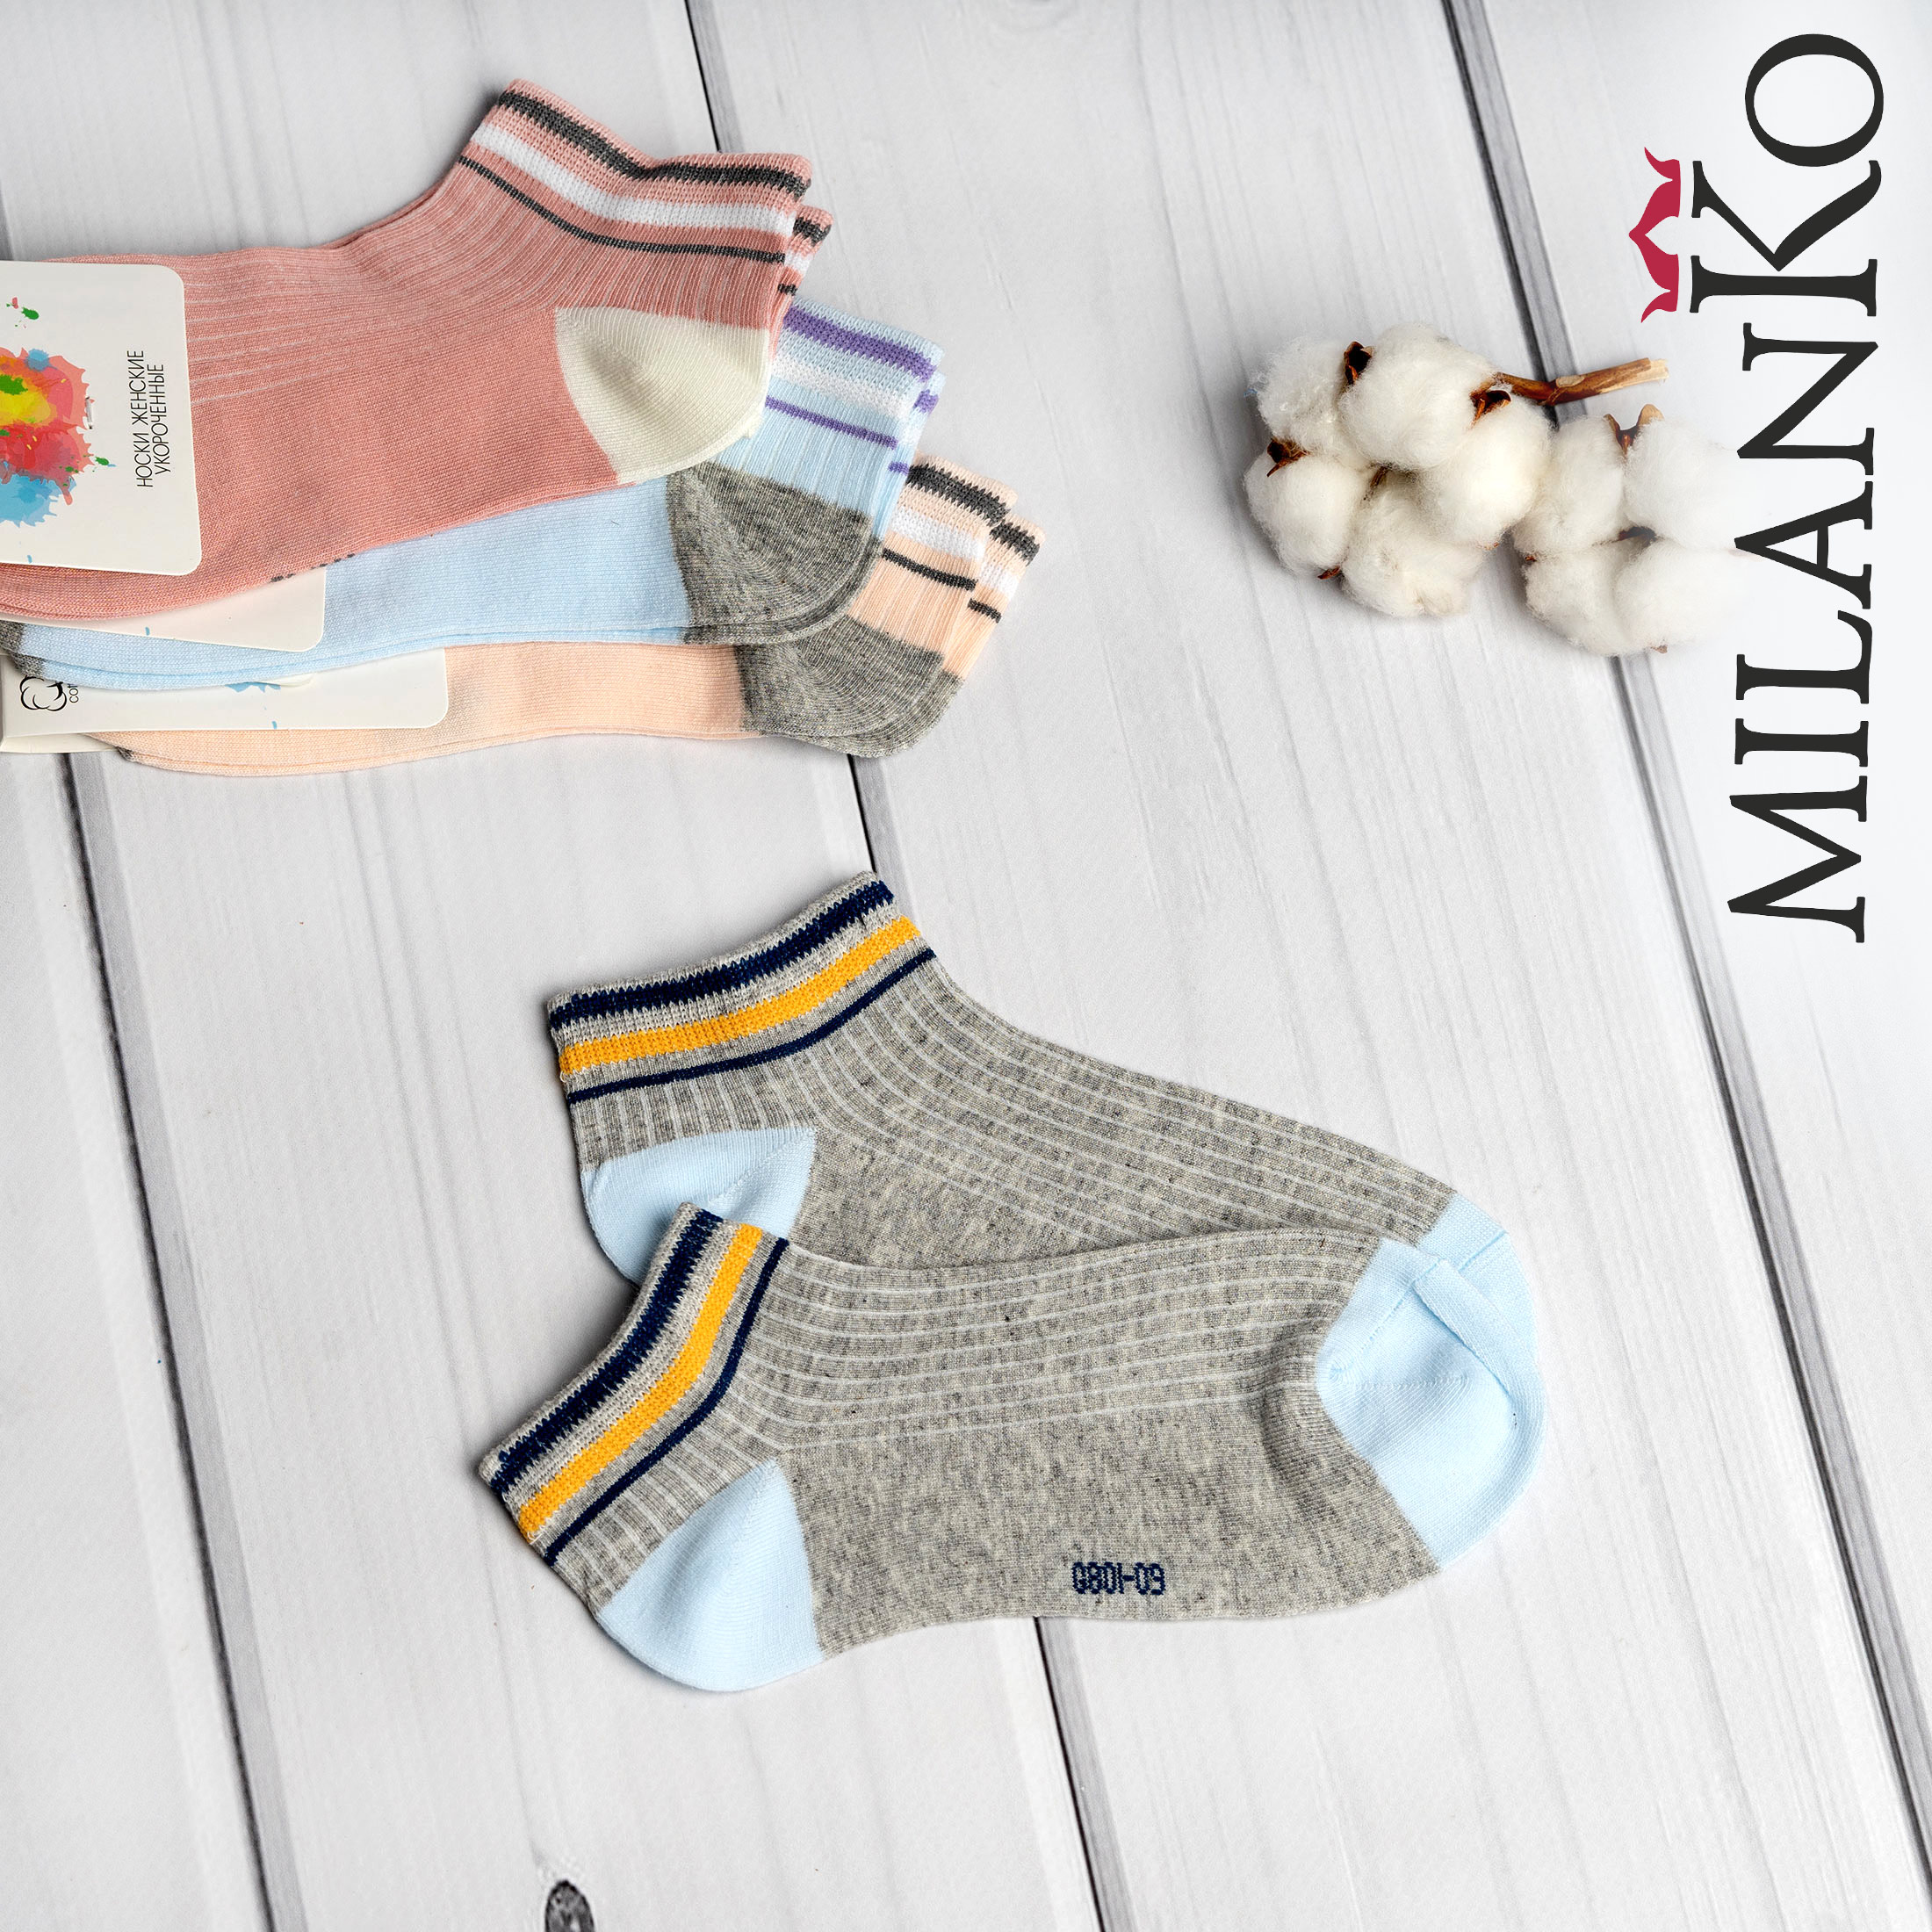 MILANKO    Женские  носки спортивные укороченные MilanKo S-716